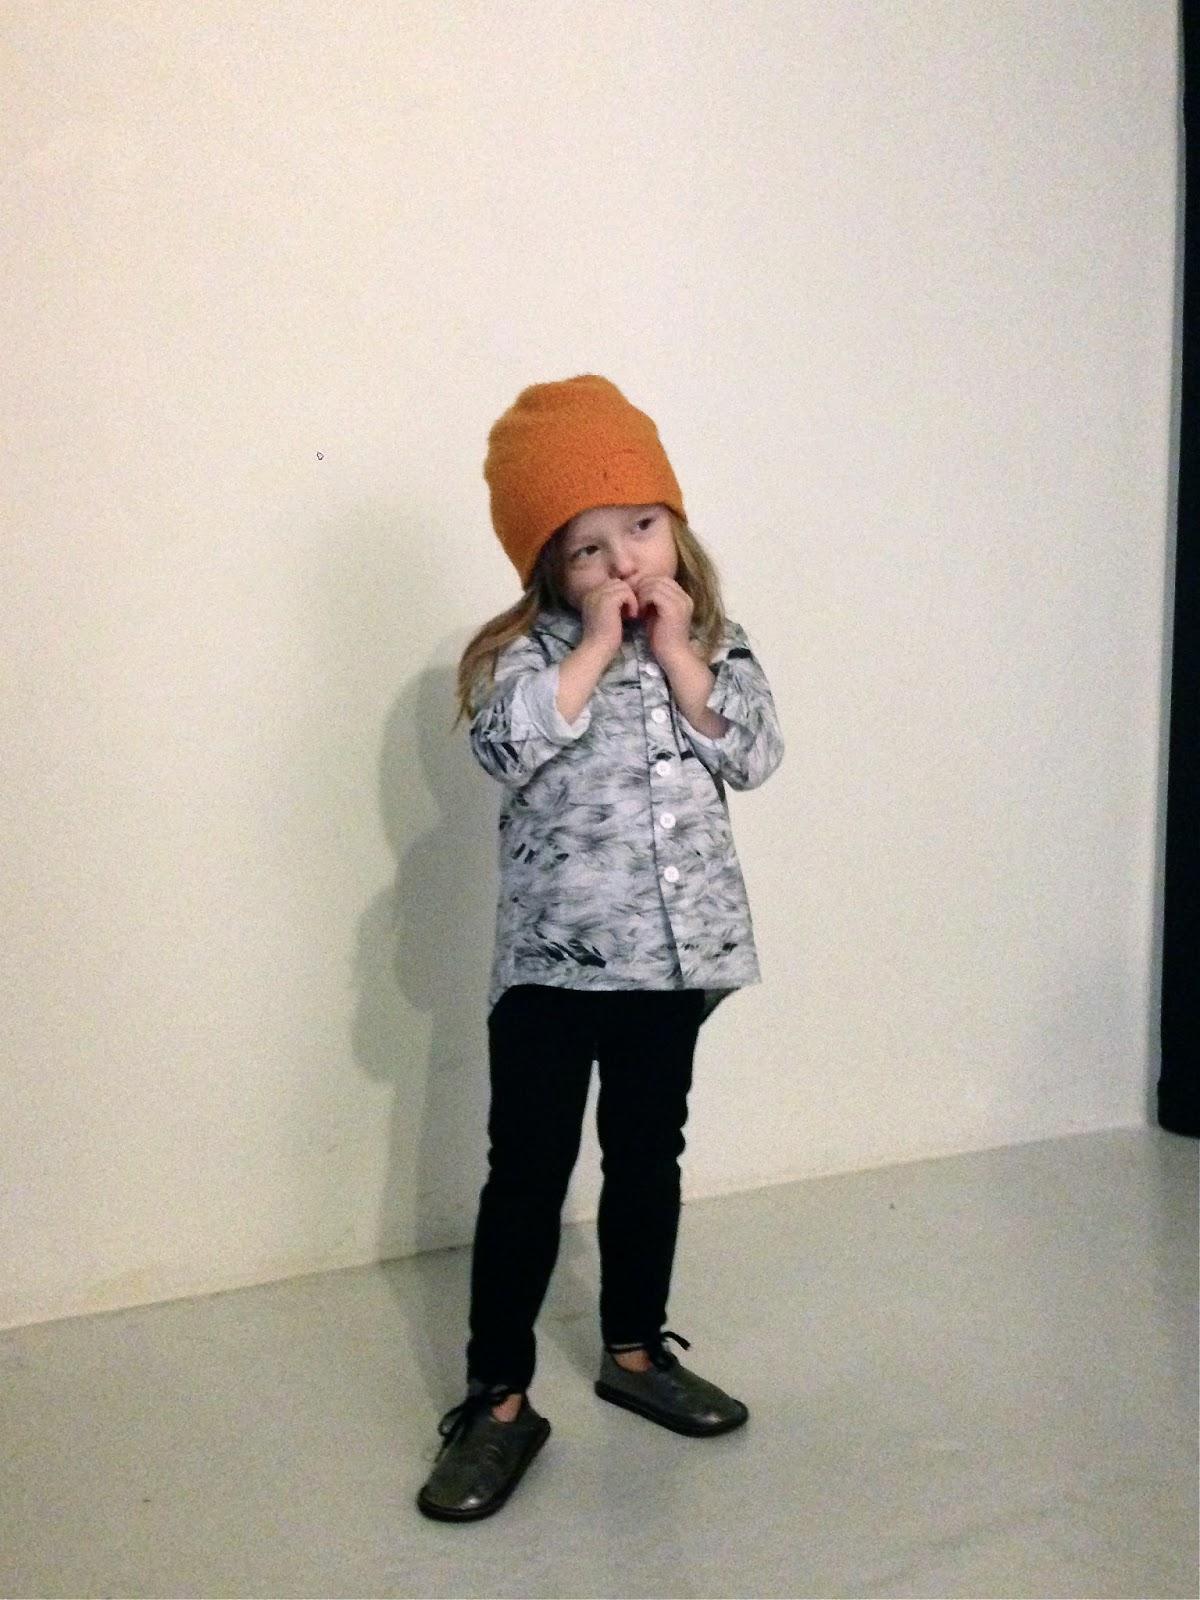 Vimma, Vimma Company, Vimmacompany, Designed in Finland, Finnish Design, Kidsclothes, Lastenvaatteet, Marjut Rahkola, Merja Yeung, Barnkläder, SS15